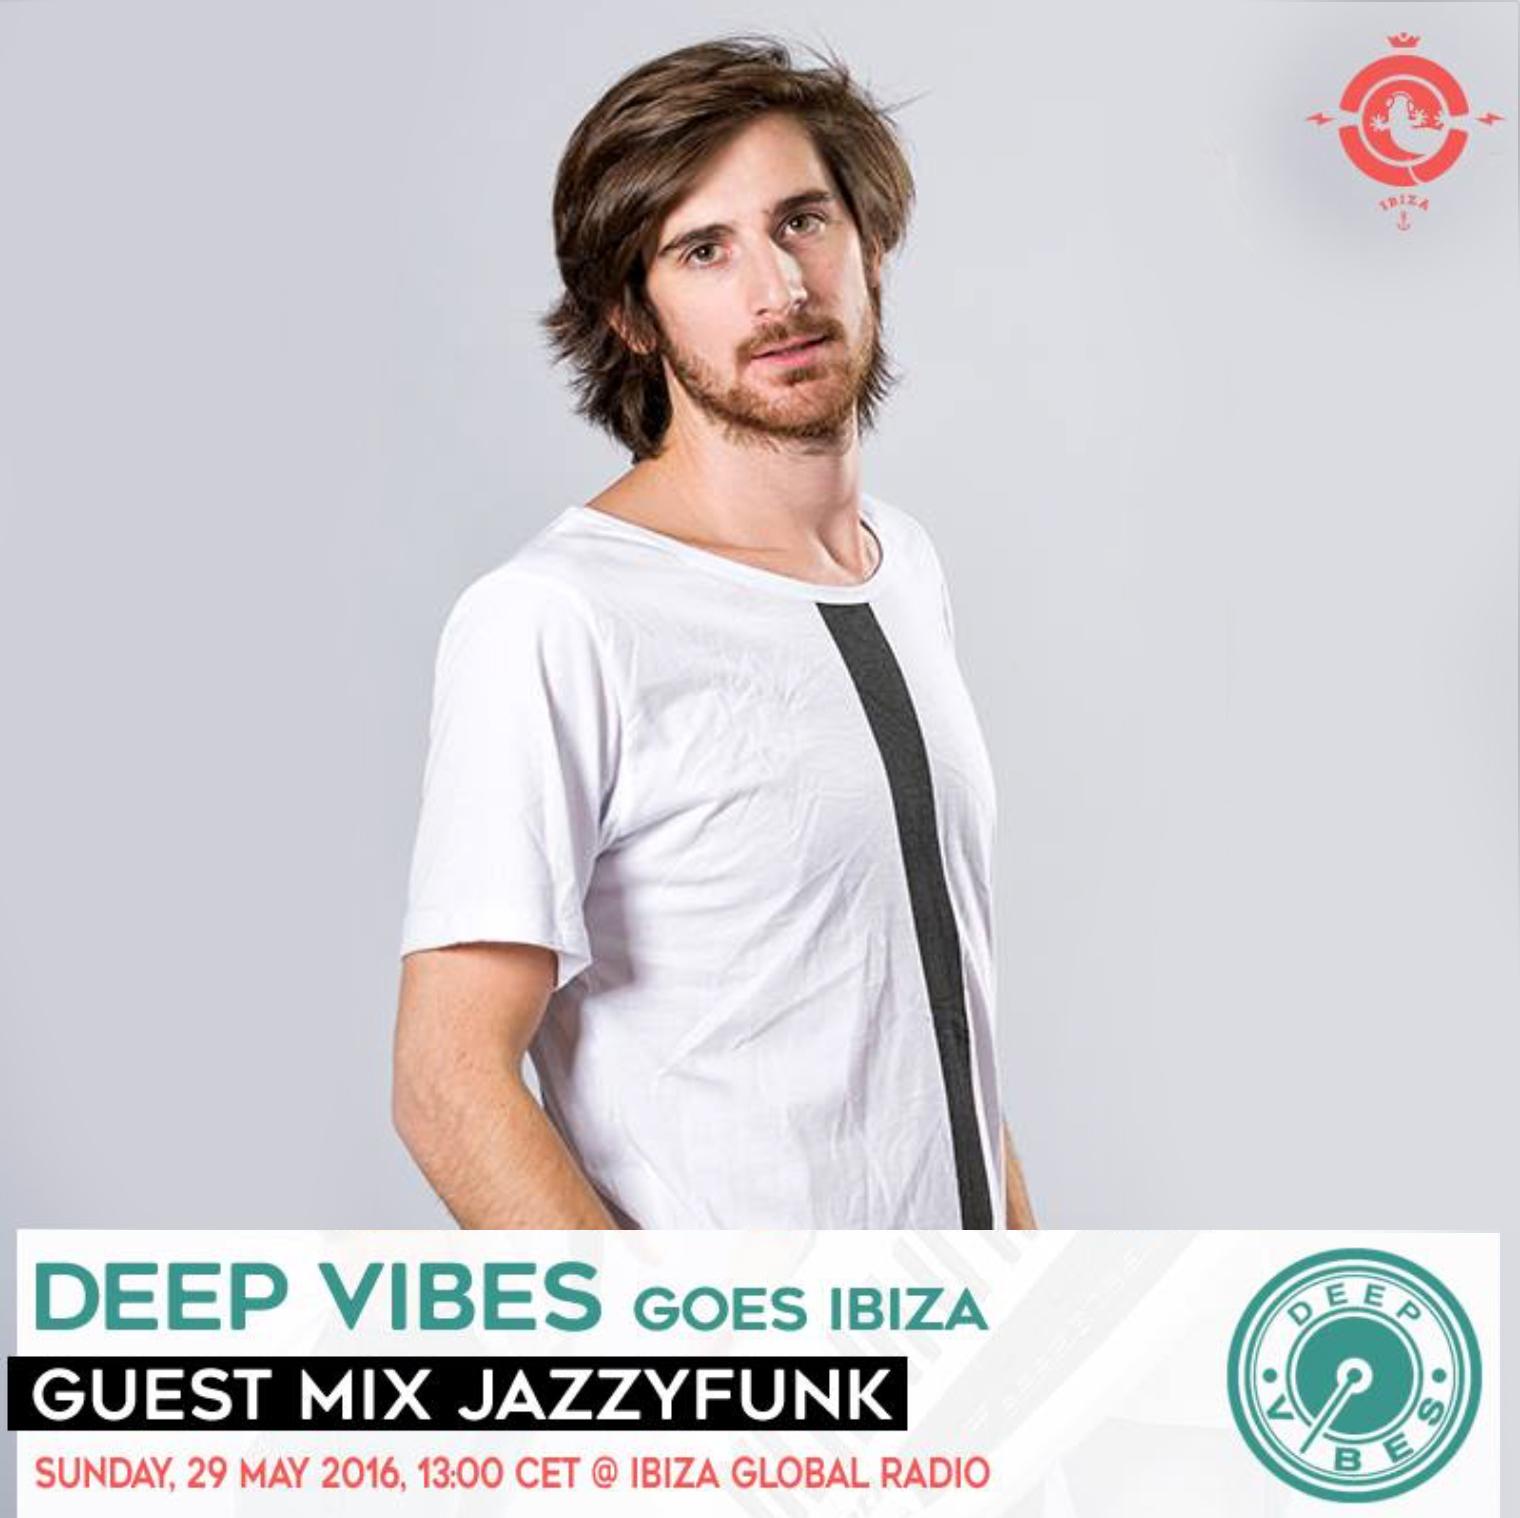 Deep Vibes on IbizaGlobalRadio 29.05.2016